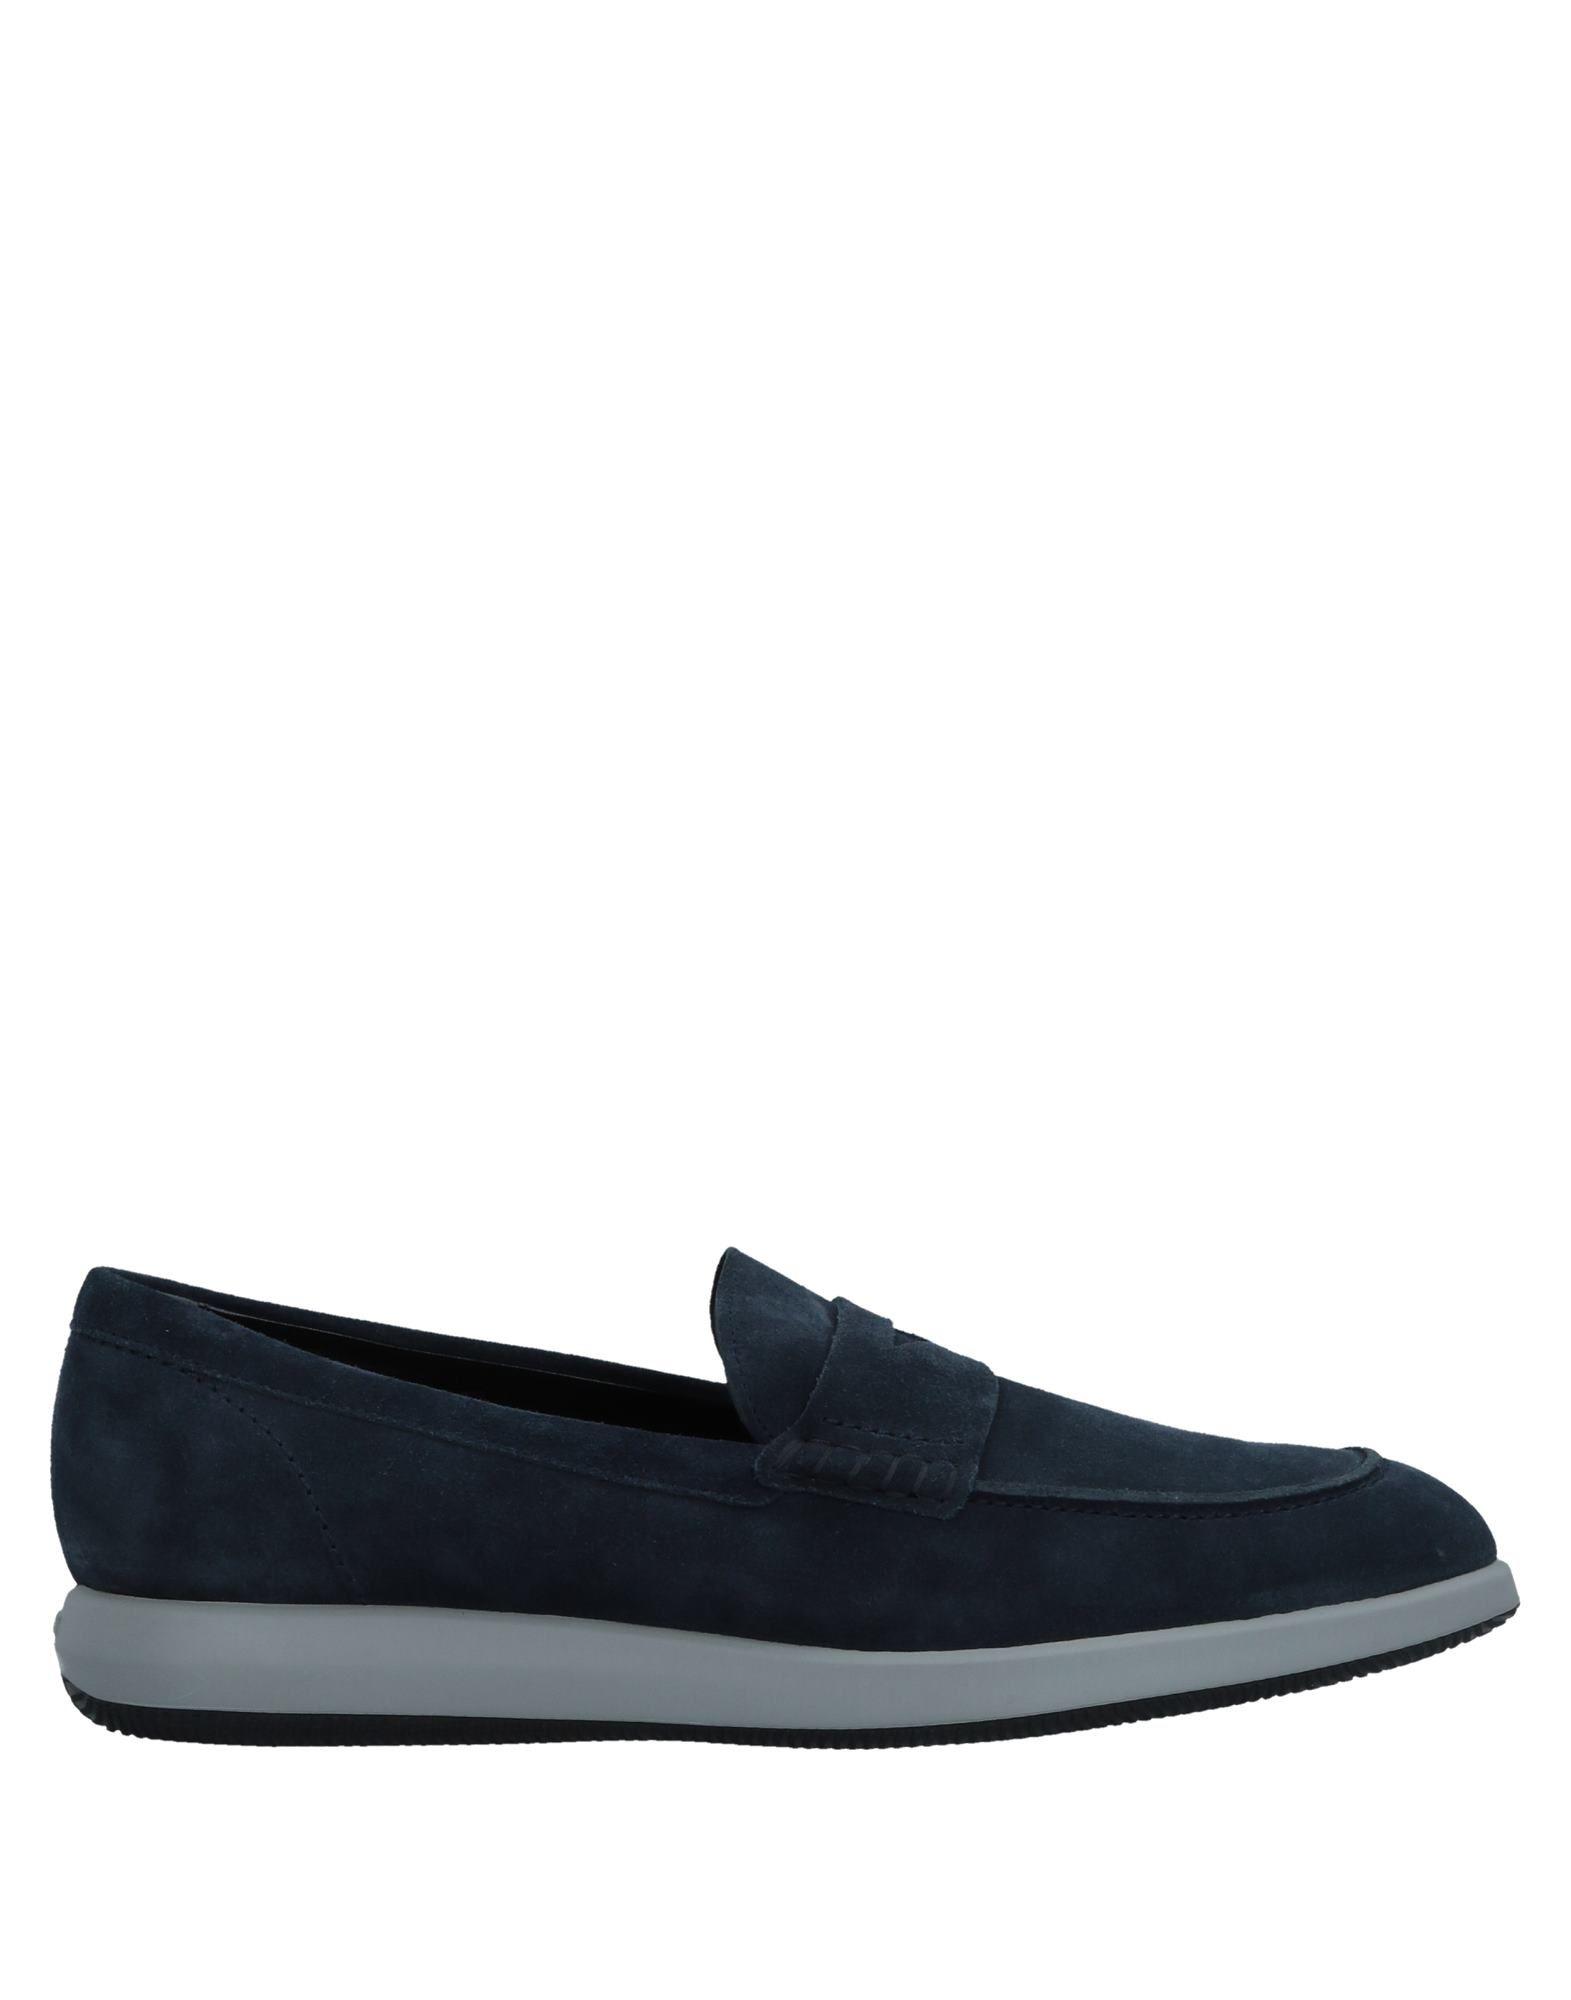 Hogan Mokassins Herren  11520622QH Gute Qualität beliebte Schuhe